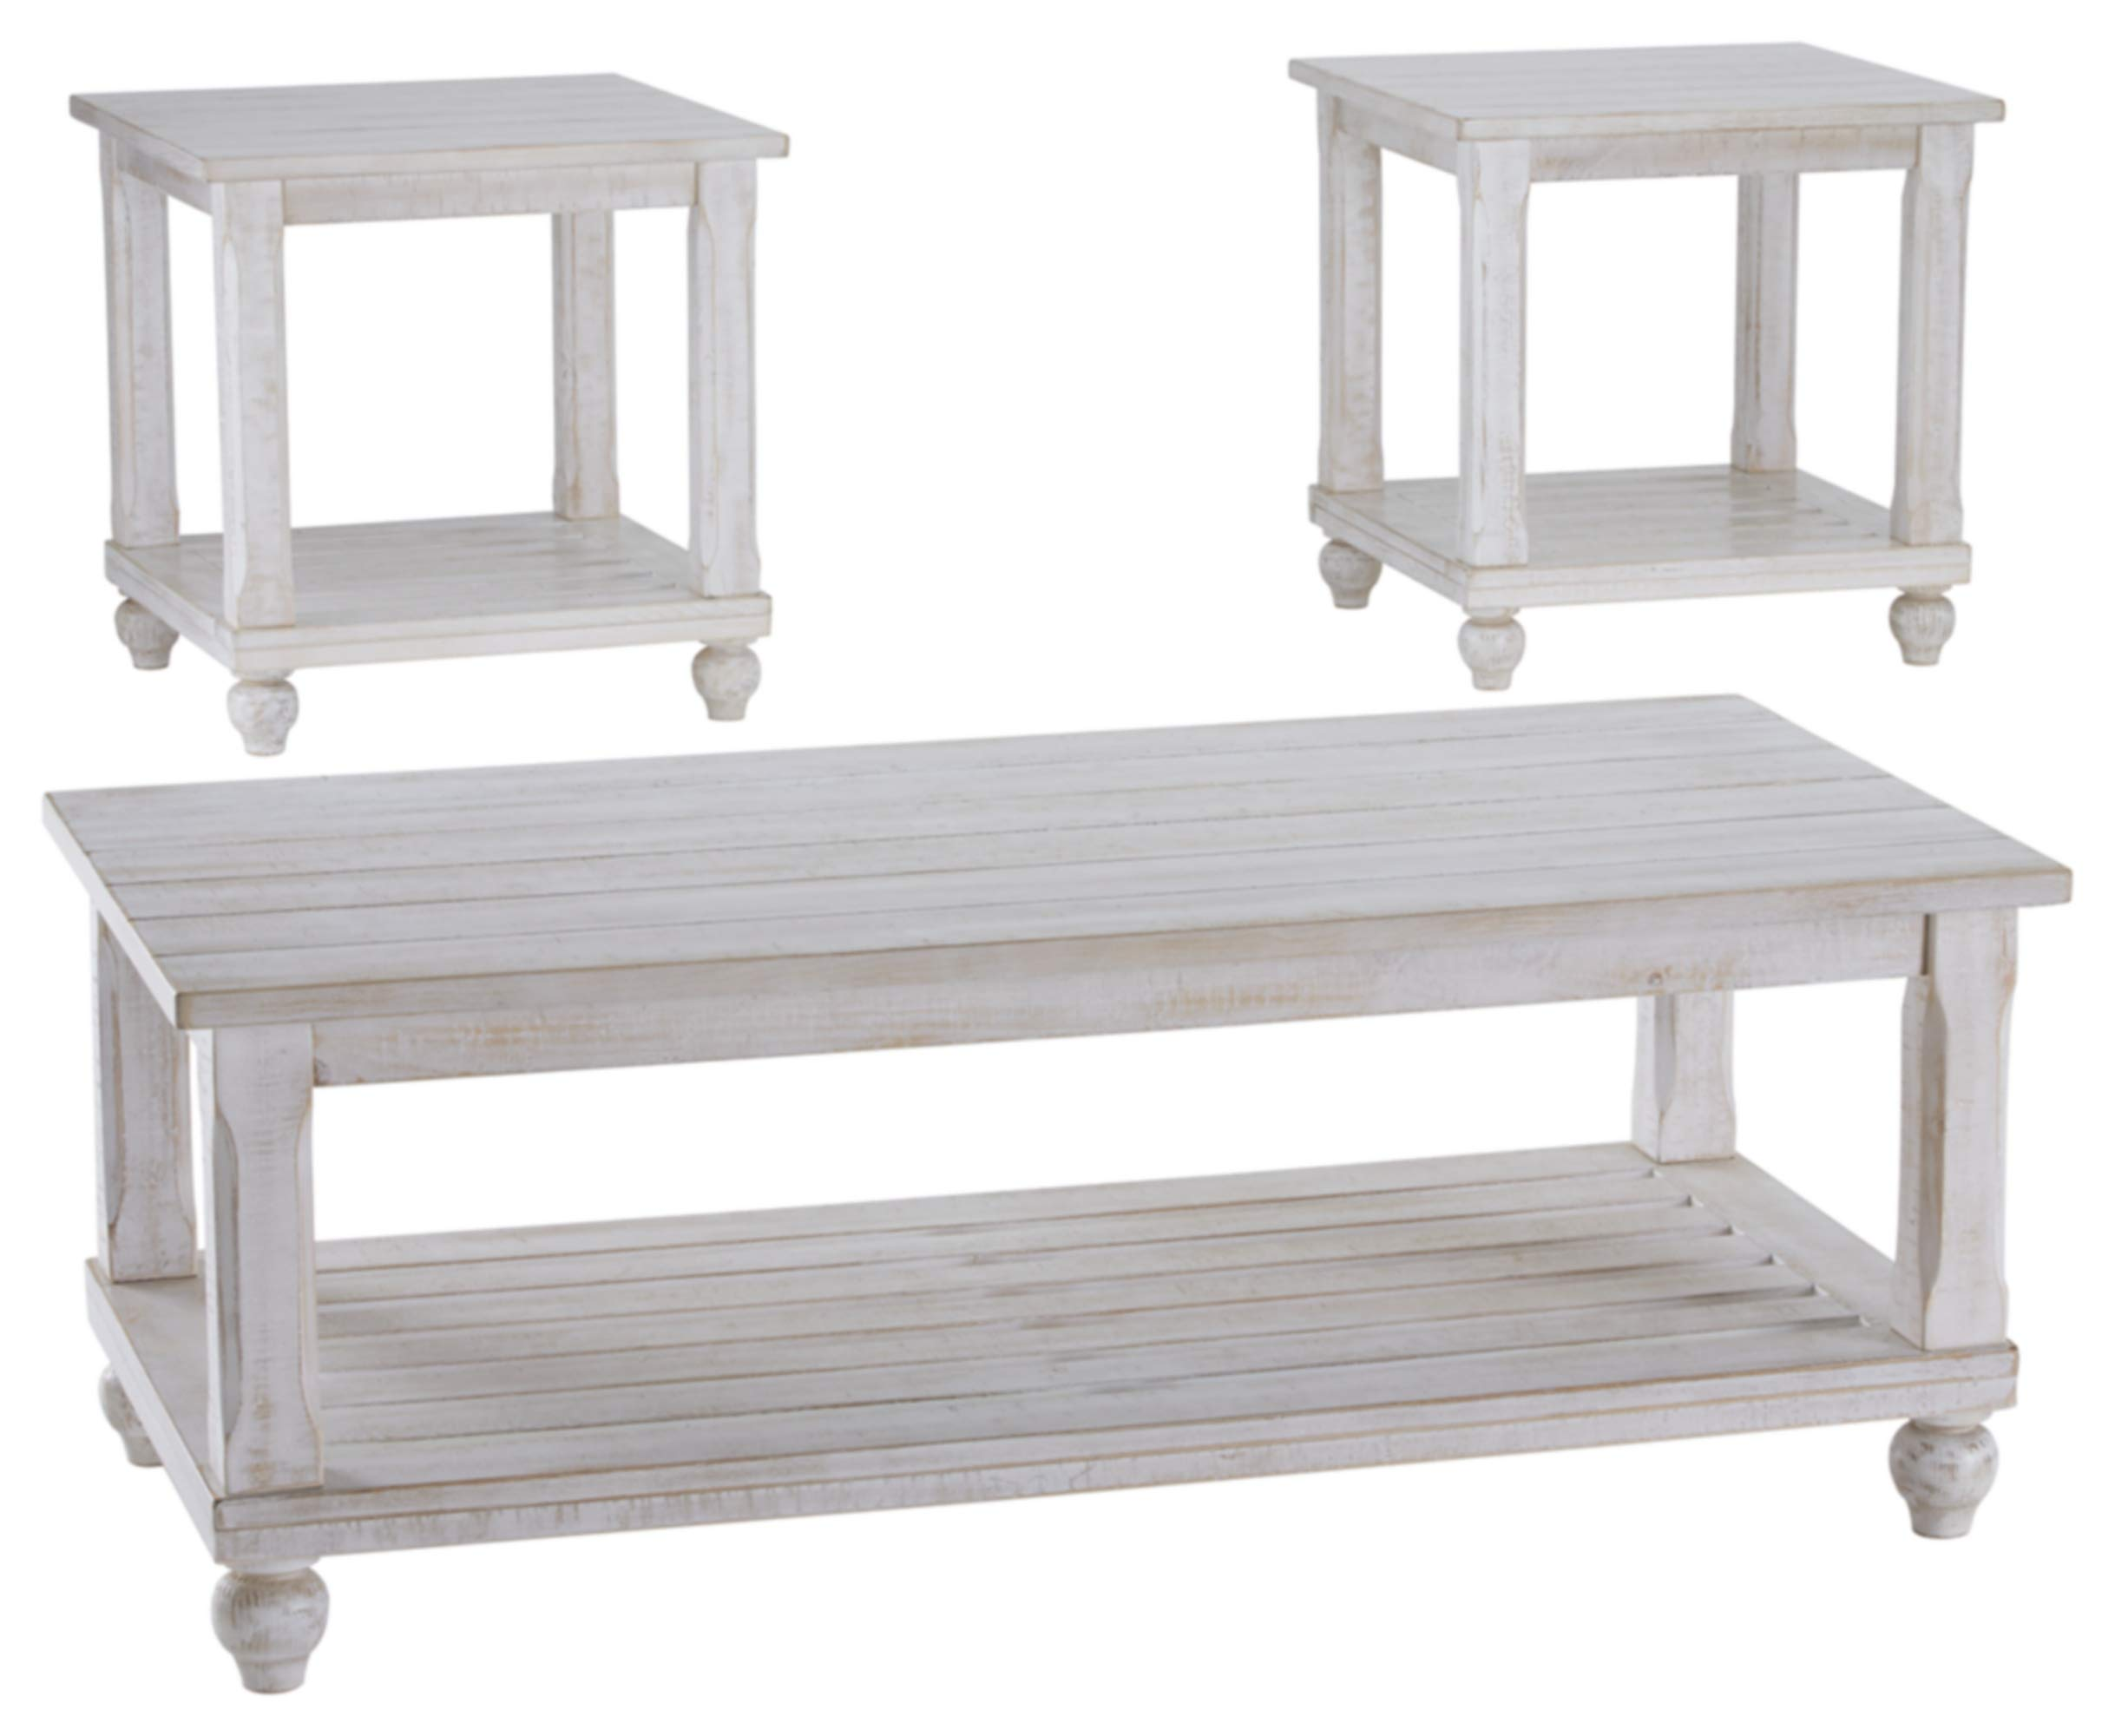 Ashley Furniture Signature Design - Cloudhurst Contemporary 3-Piece Table Set - Includes Cocktail Table & Two End Tables - White by Signature Design by Ashley